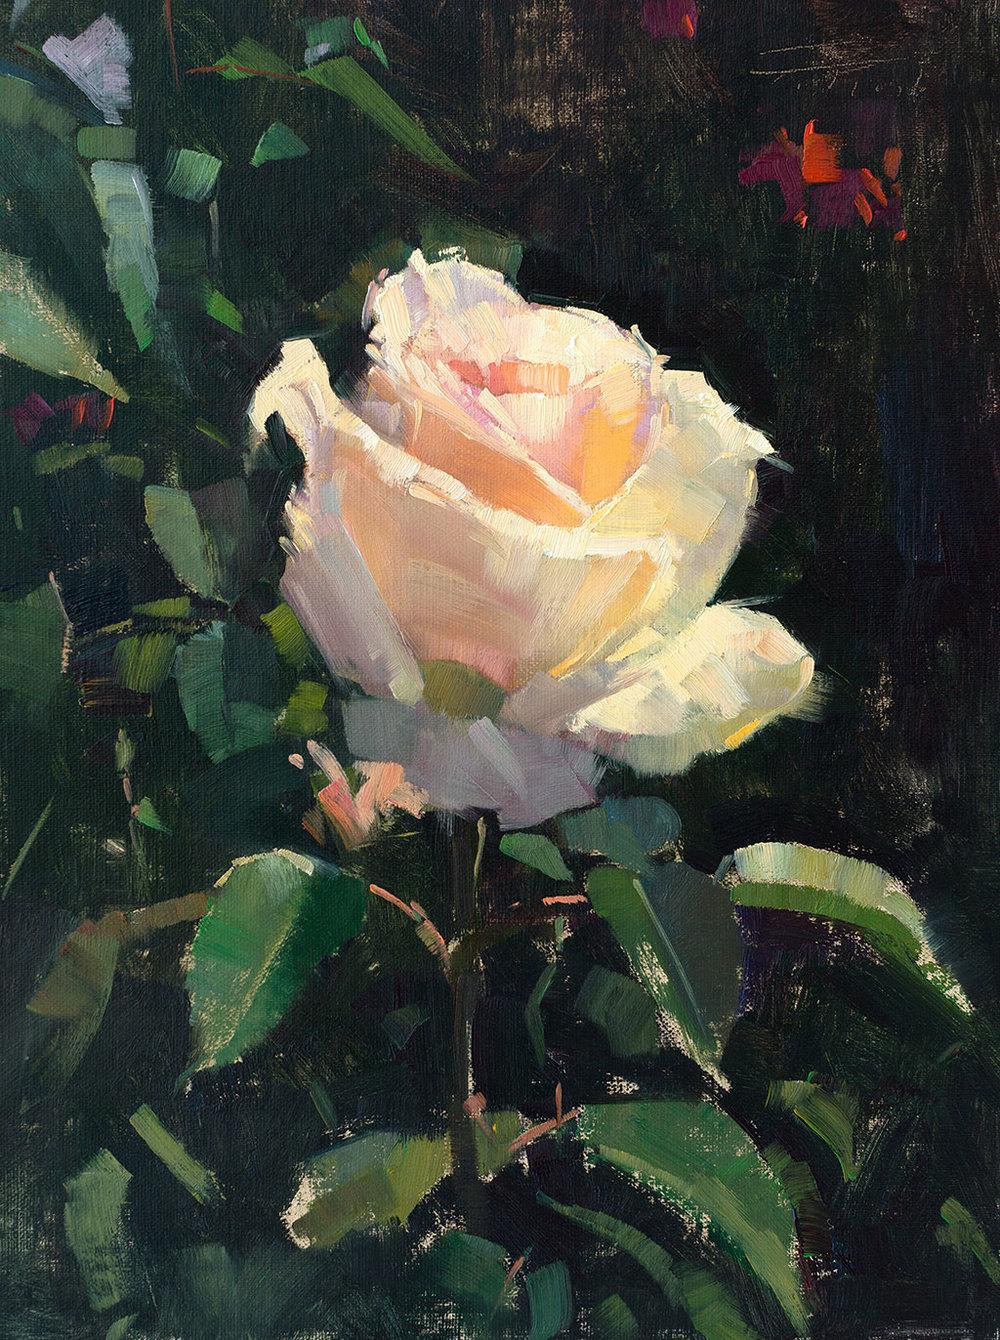 patrick-saunders-painting-floral-white-rose-aglow.jpg